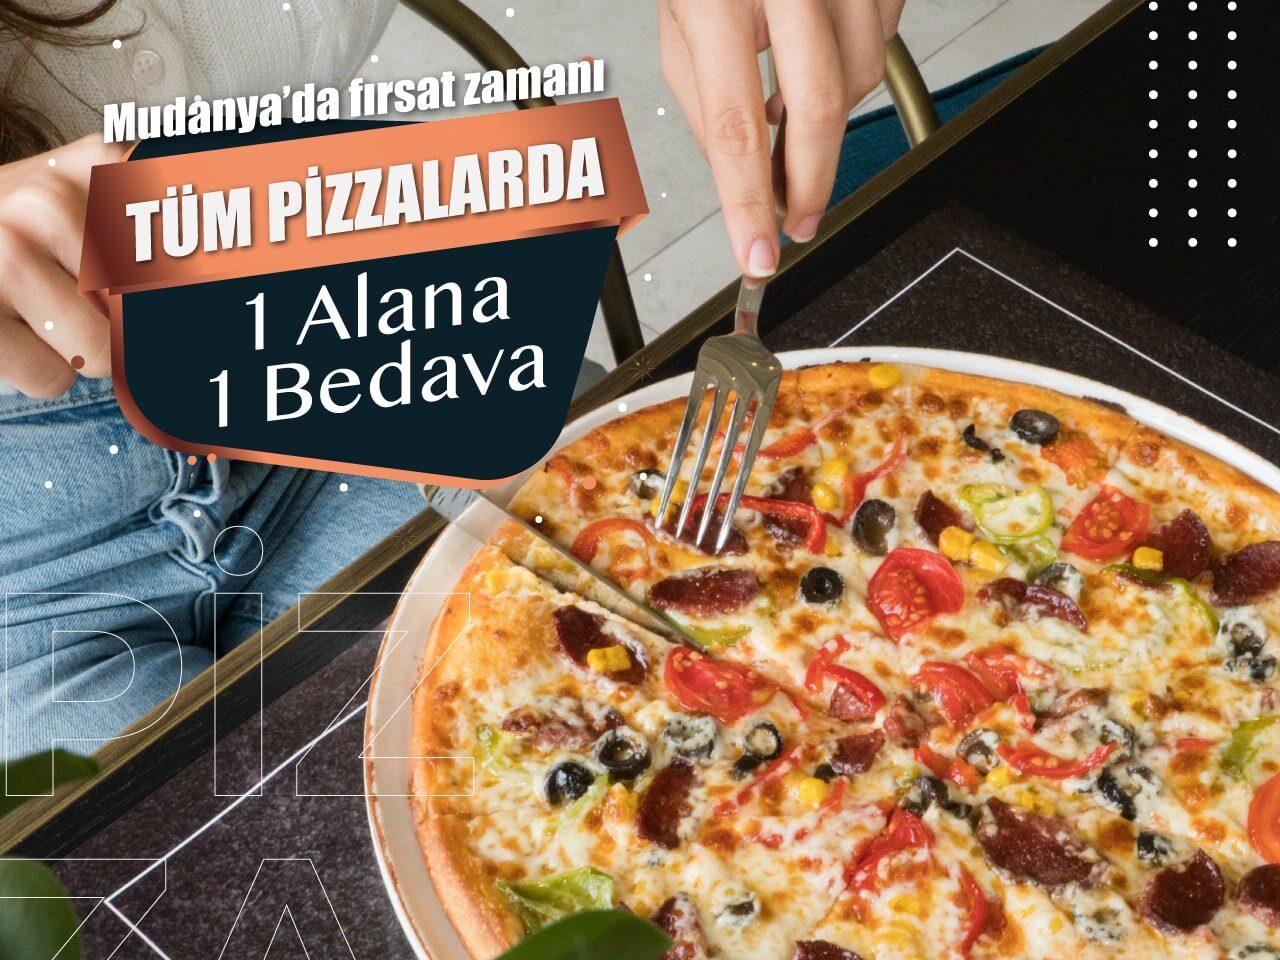 Bursa'da bu hafta ne yapsak?-12 / Bursa kafe-restoran tavsiyesi-12